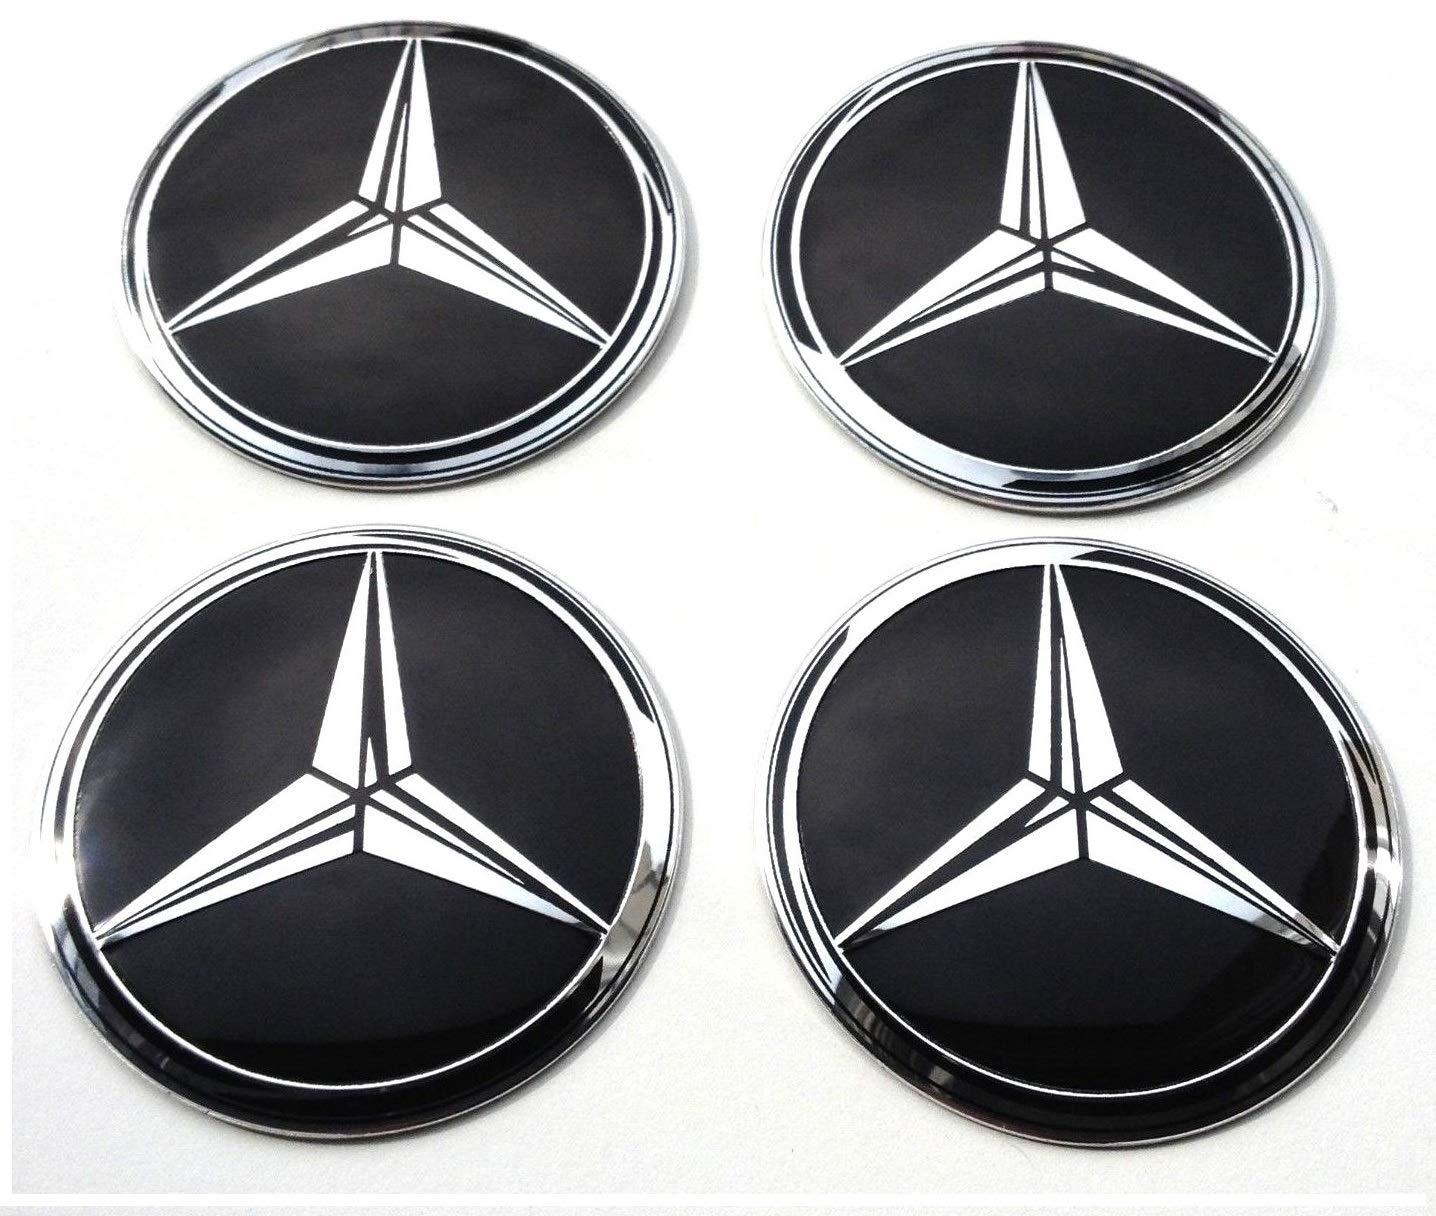 para tapas tapacubos MercedesBenz autoadhesivas Conjunto de 4 x 60mm pegatinas de rueda